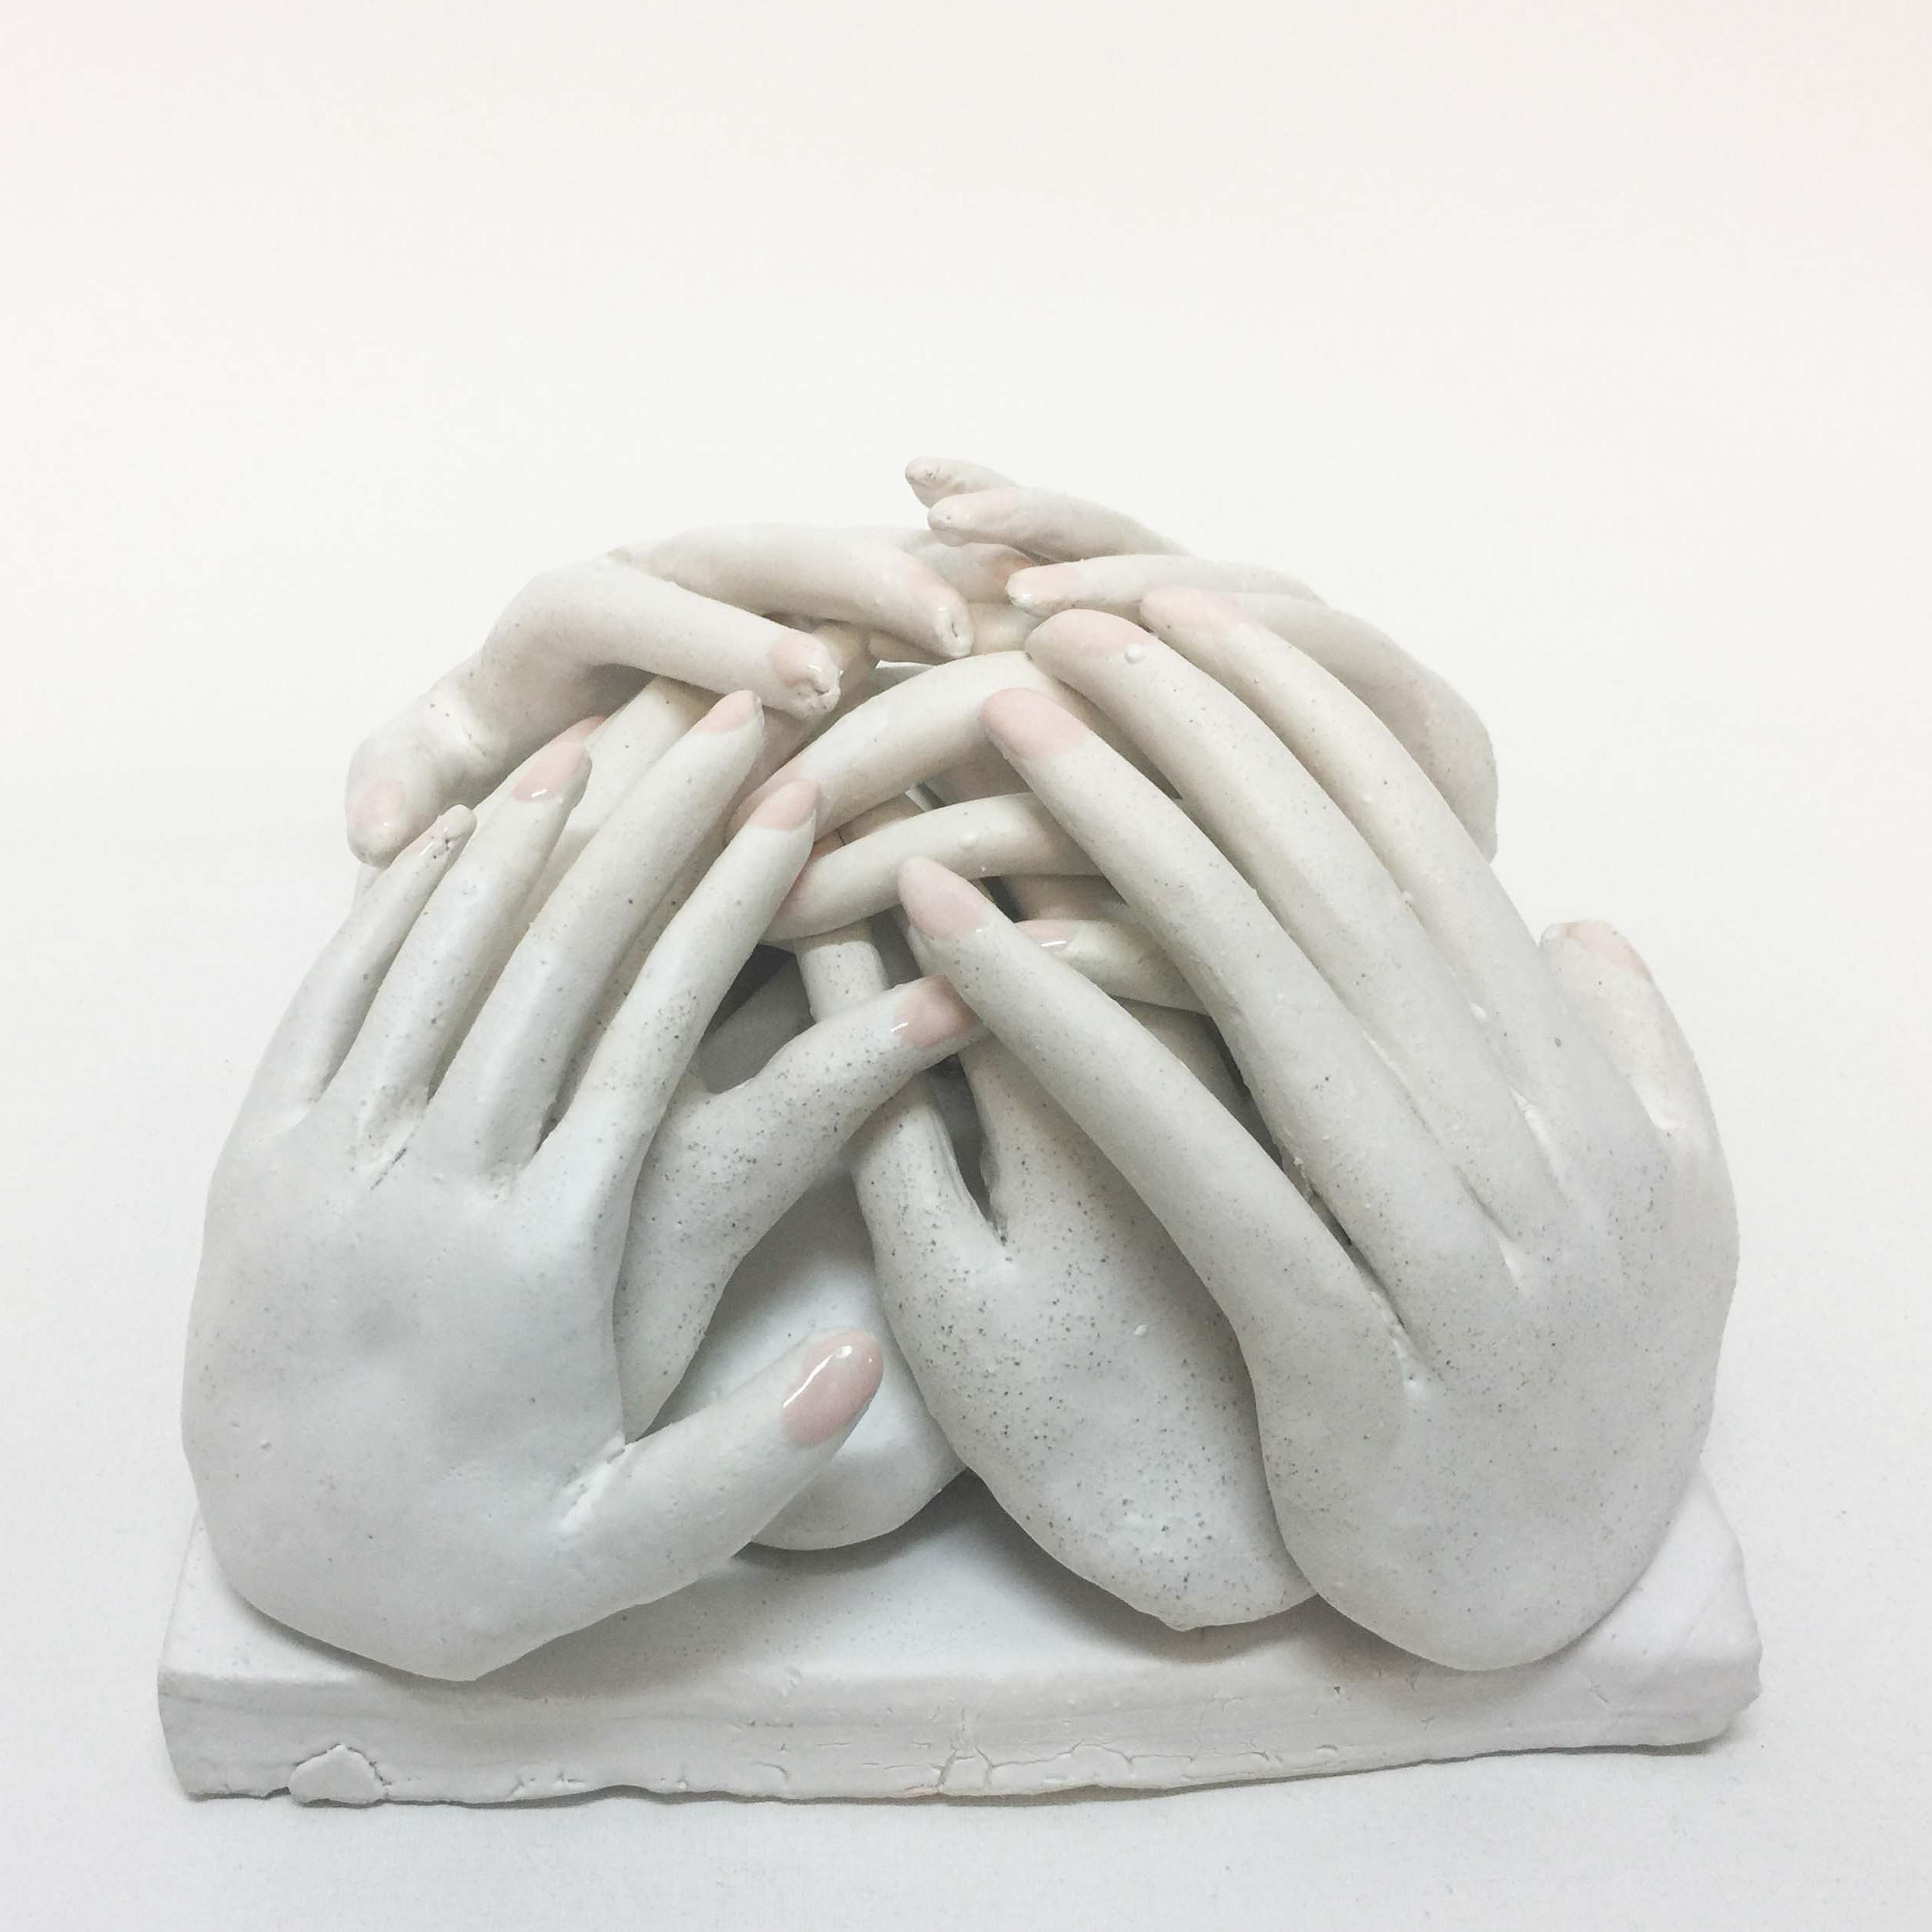 Lusesita, Manos a la obra, 2018, ceramic and enamel, 12x21x21 cm